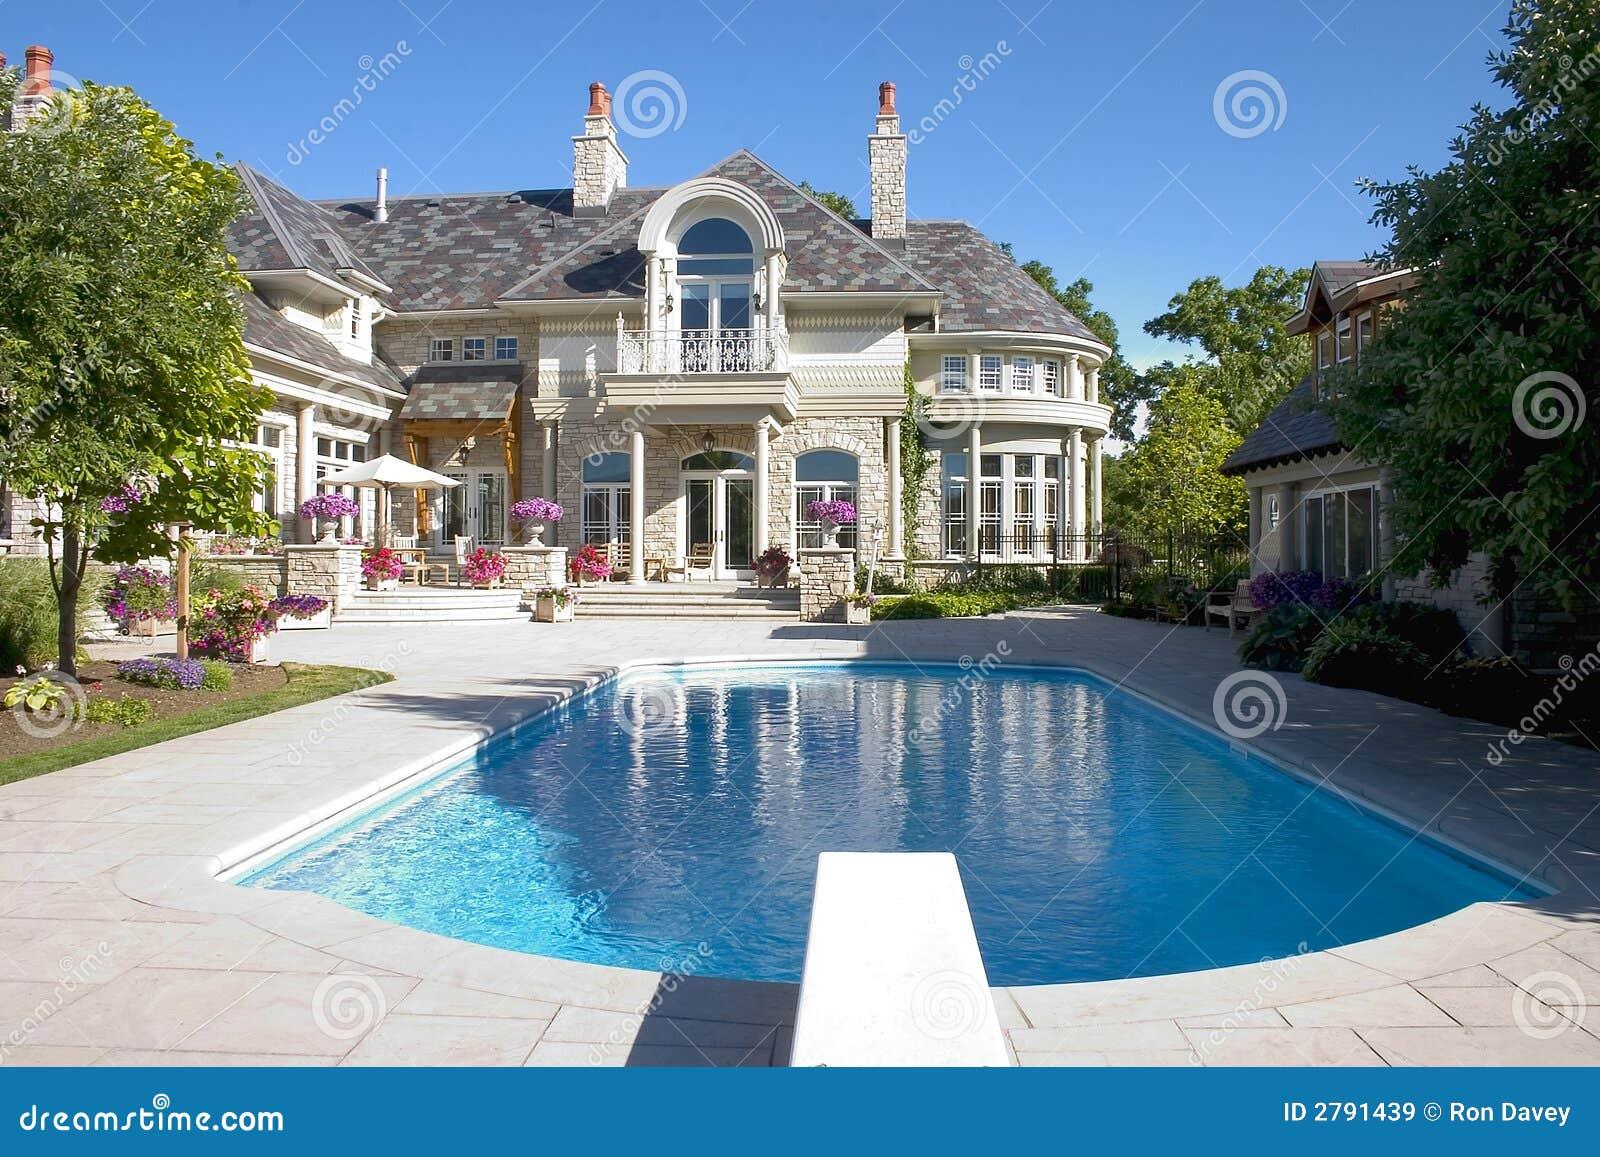 Luxury home pool shot royalty free stock images image for Free luxury home images